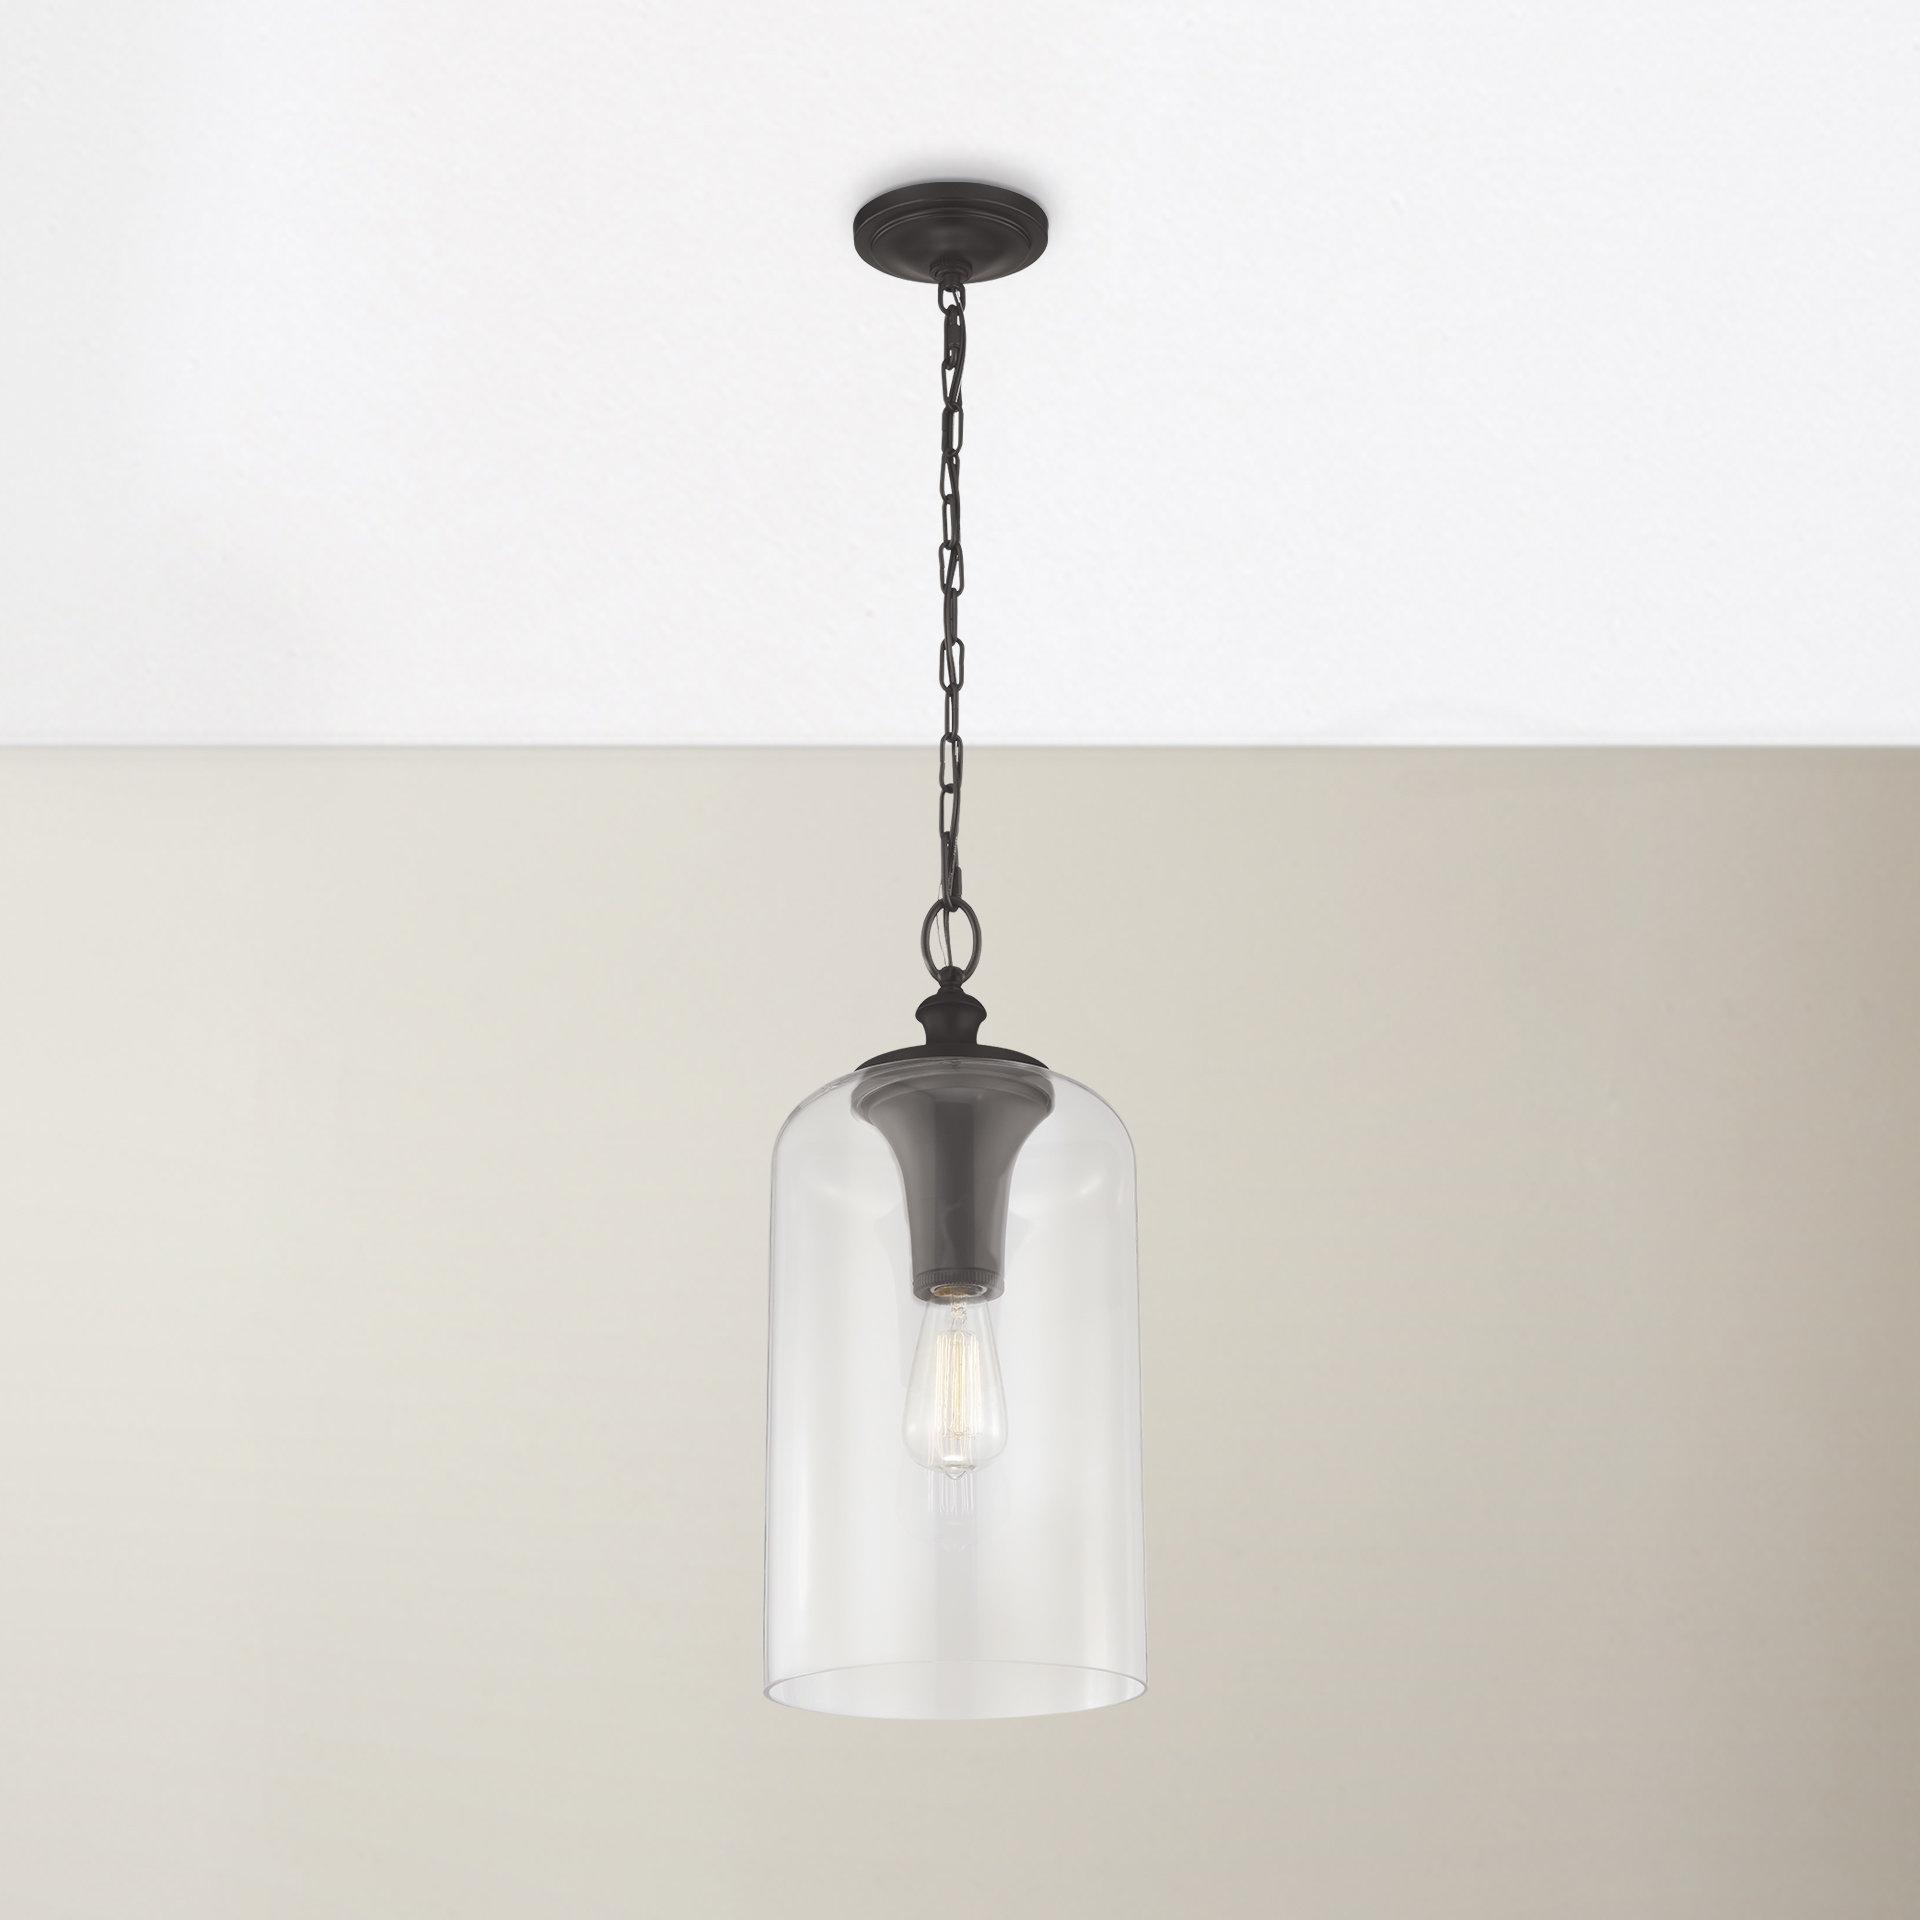 Nolan 1 Light Single Cylinder Pendant Regarding Well Liked Nolan 1 Light Lantern Chandeliers (View 15 of 25)